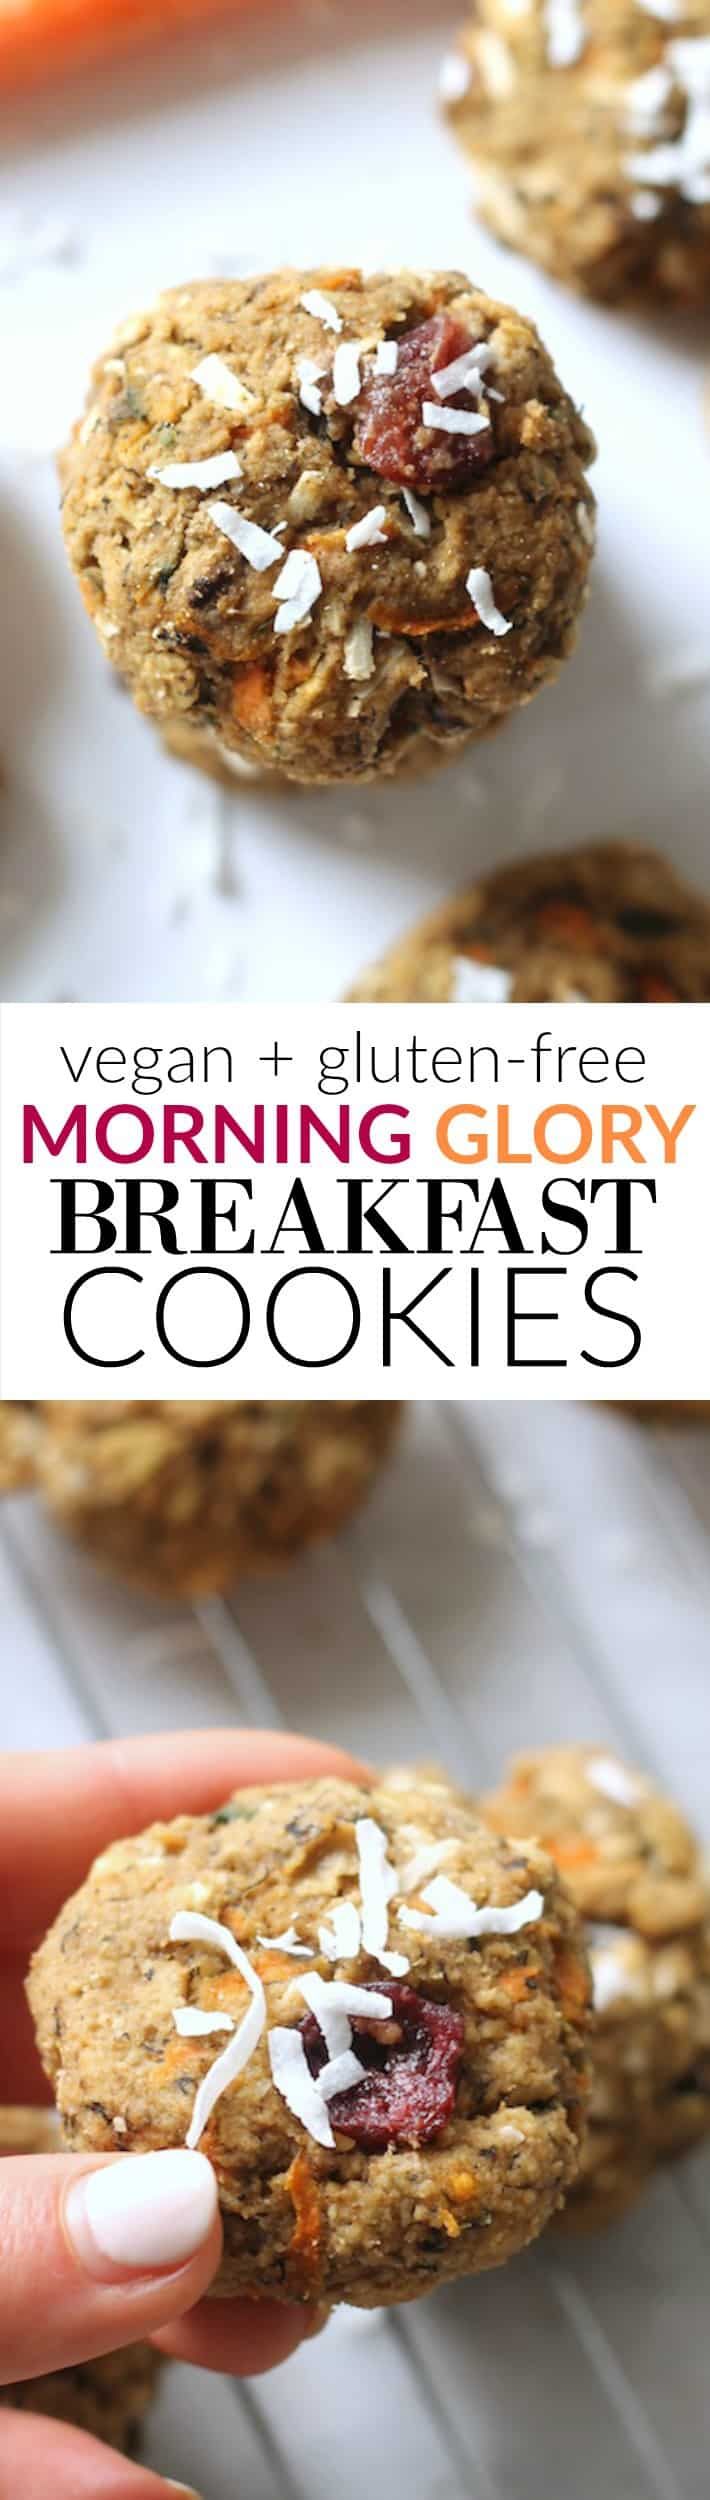 Morning Glory Breakfast Cookies...vegan, gluten-free, healthy, and flourless!